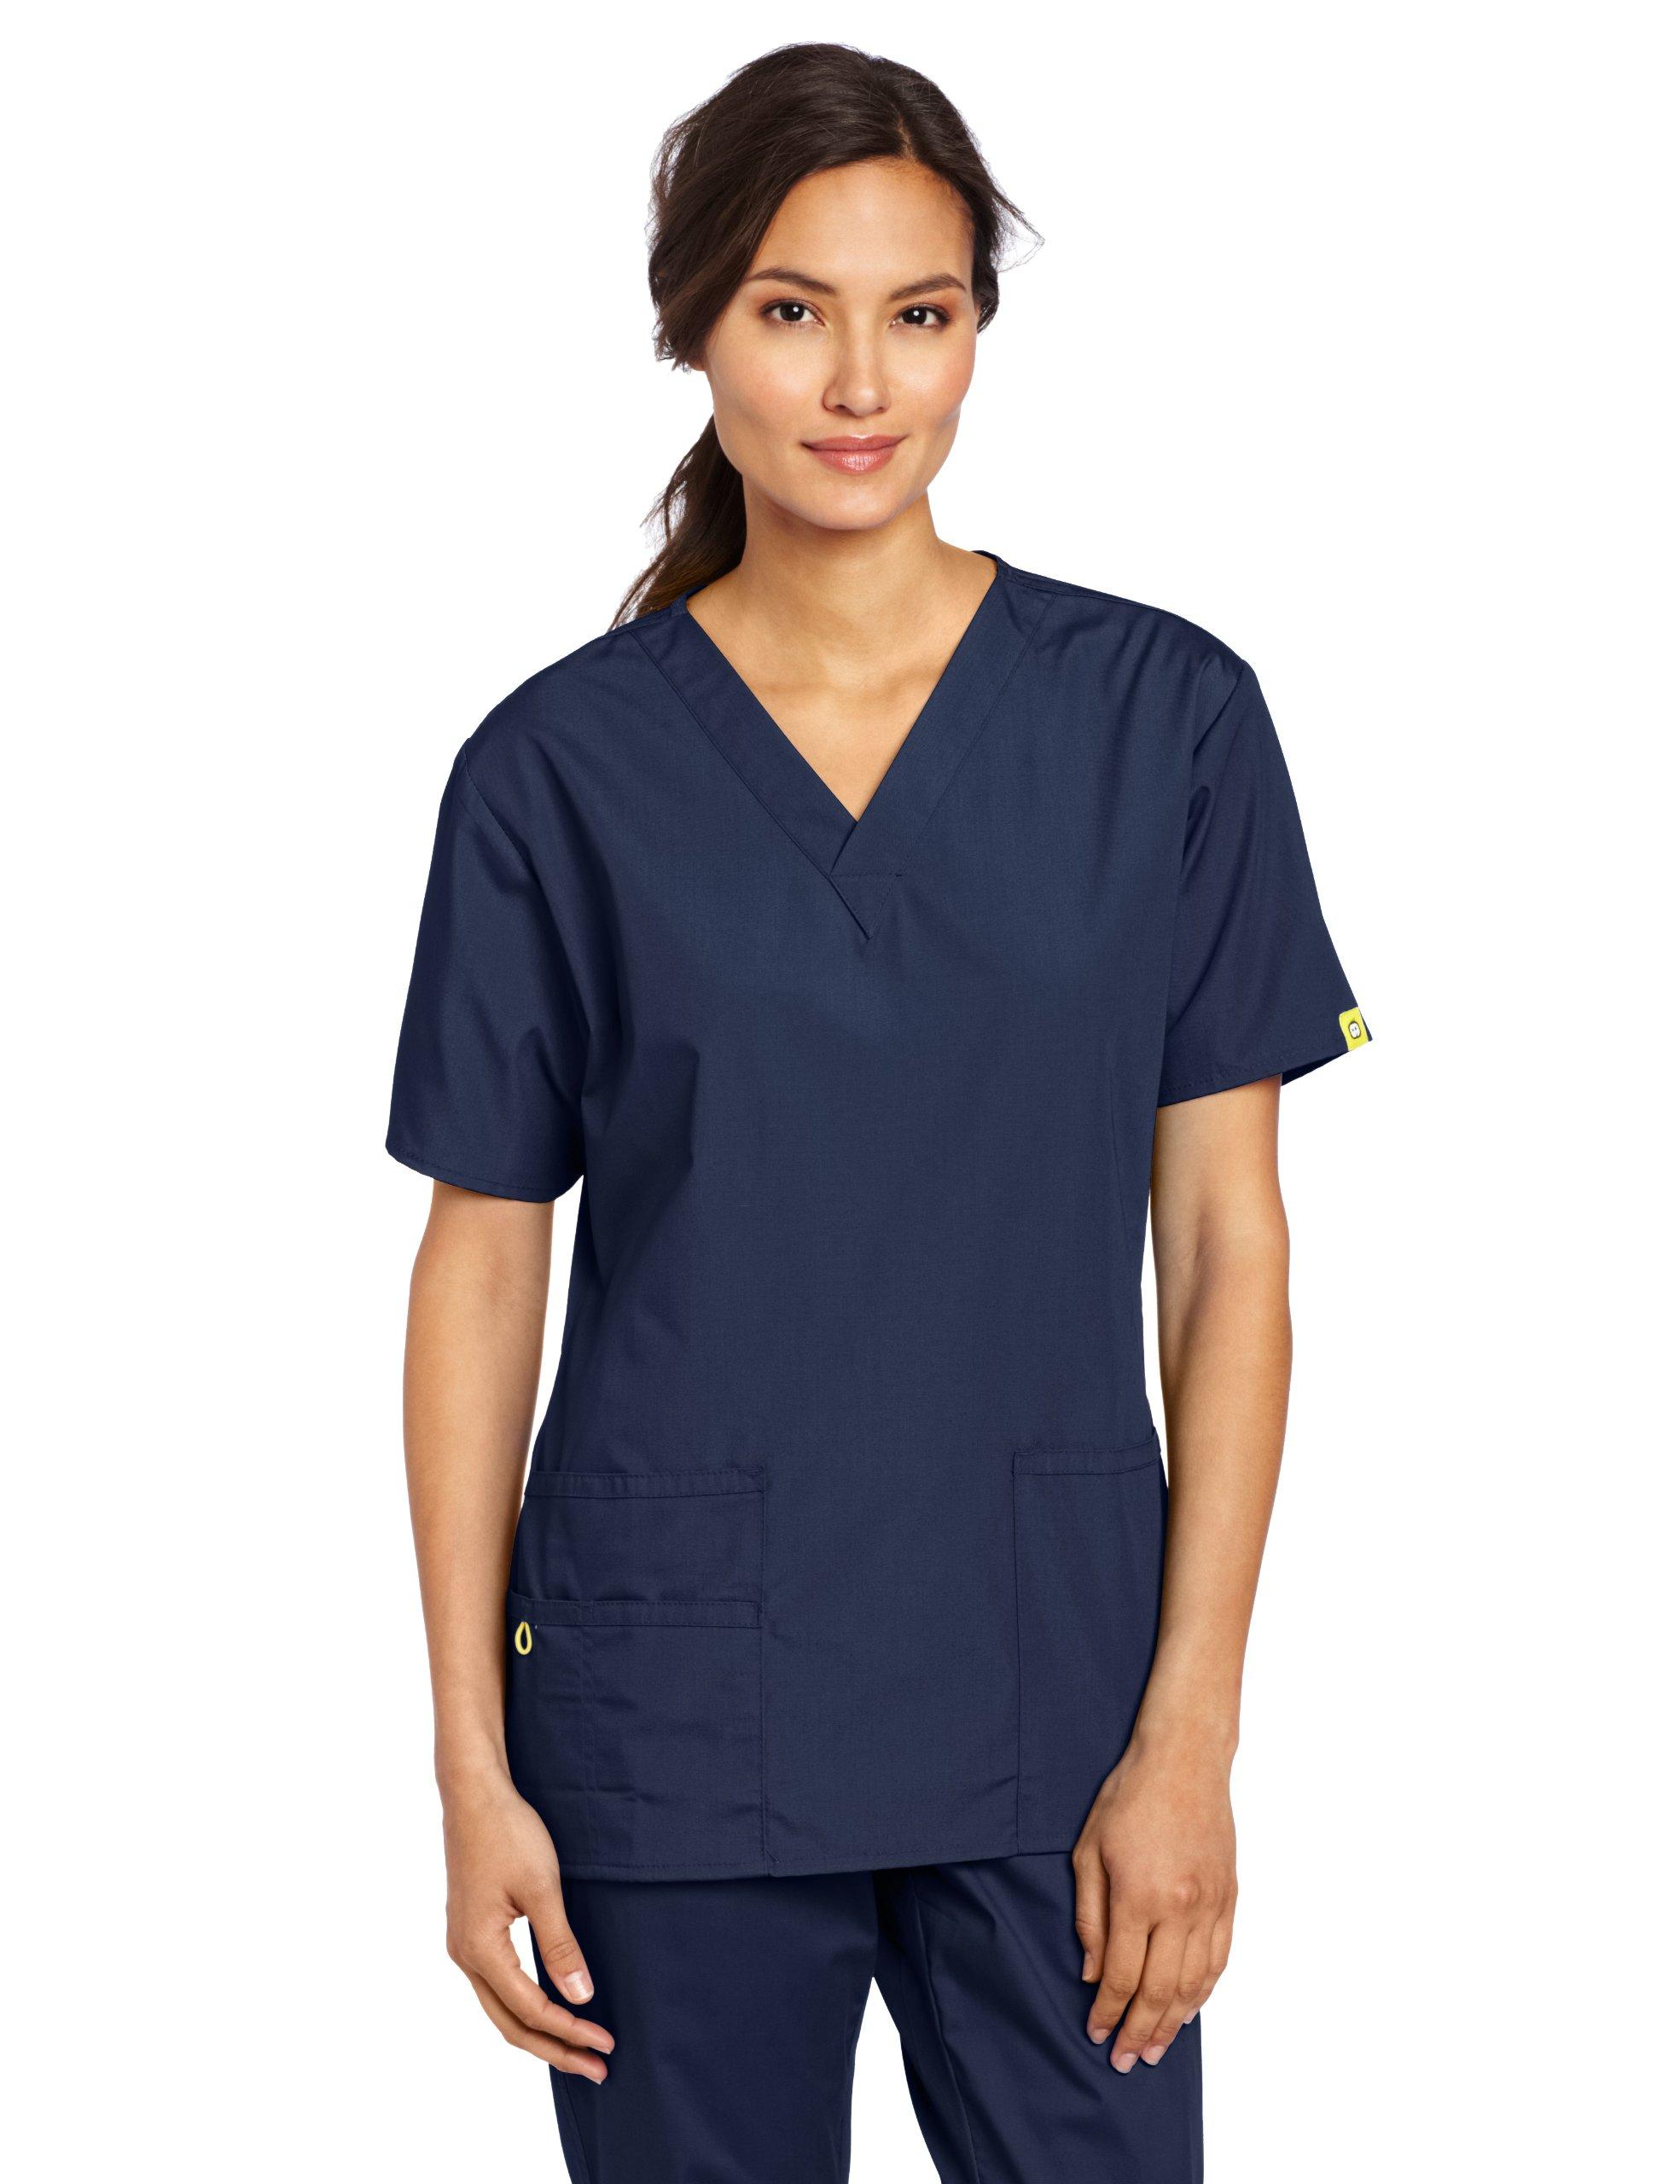 WonderWink Women's Scrubs Bravo 5 Pocket V-Neck Top, Navy, Large